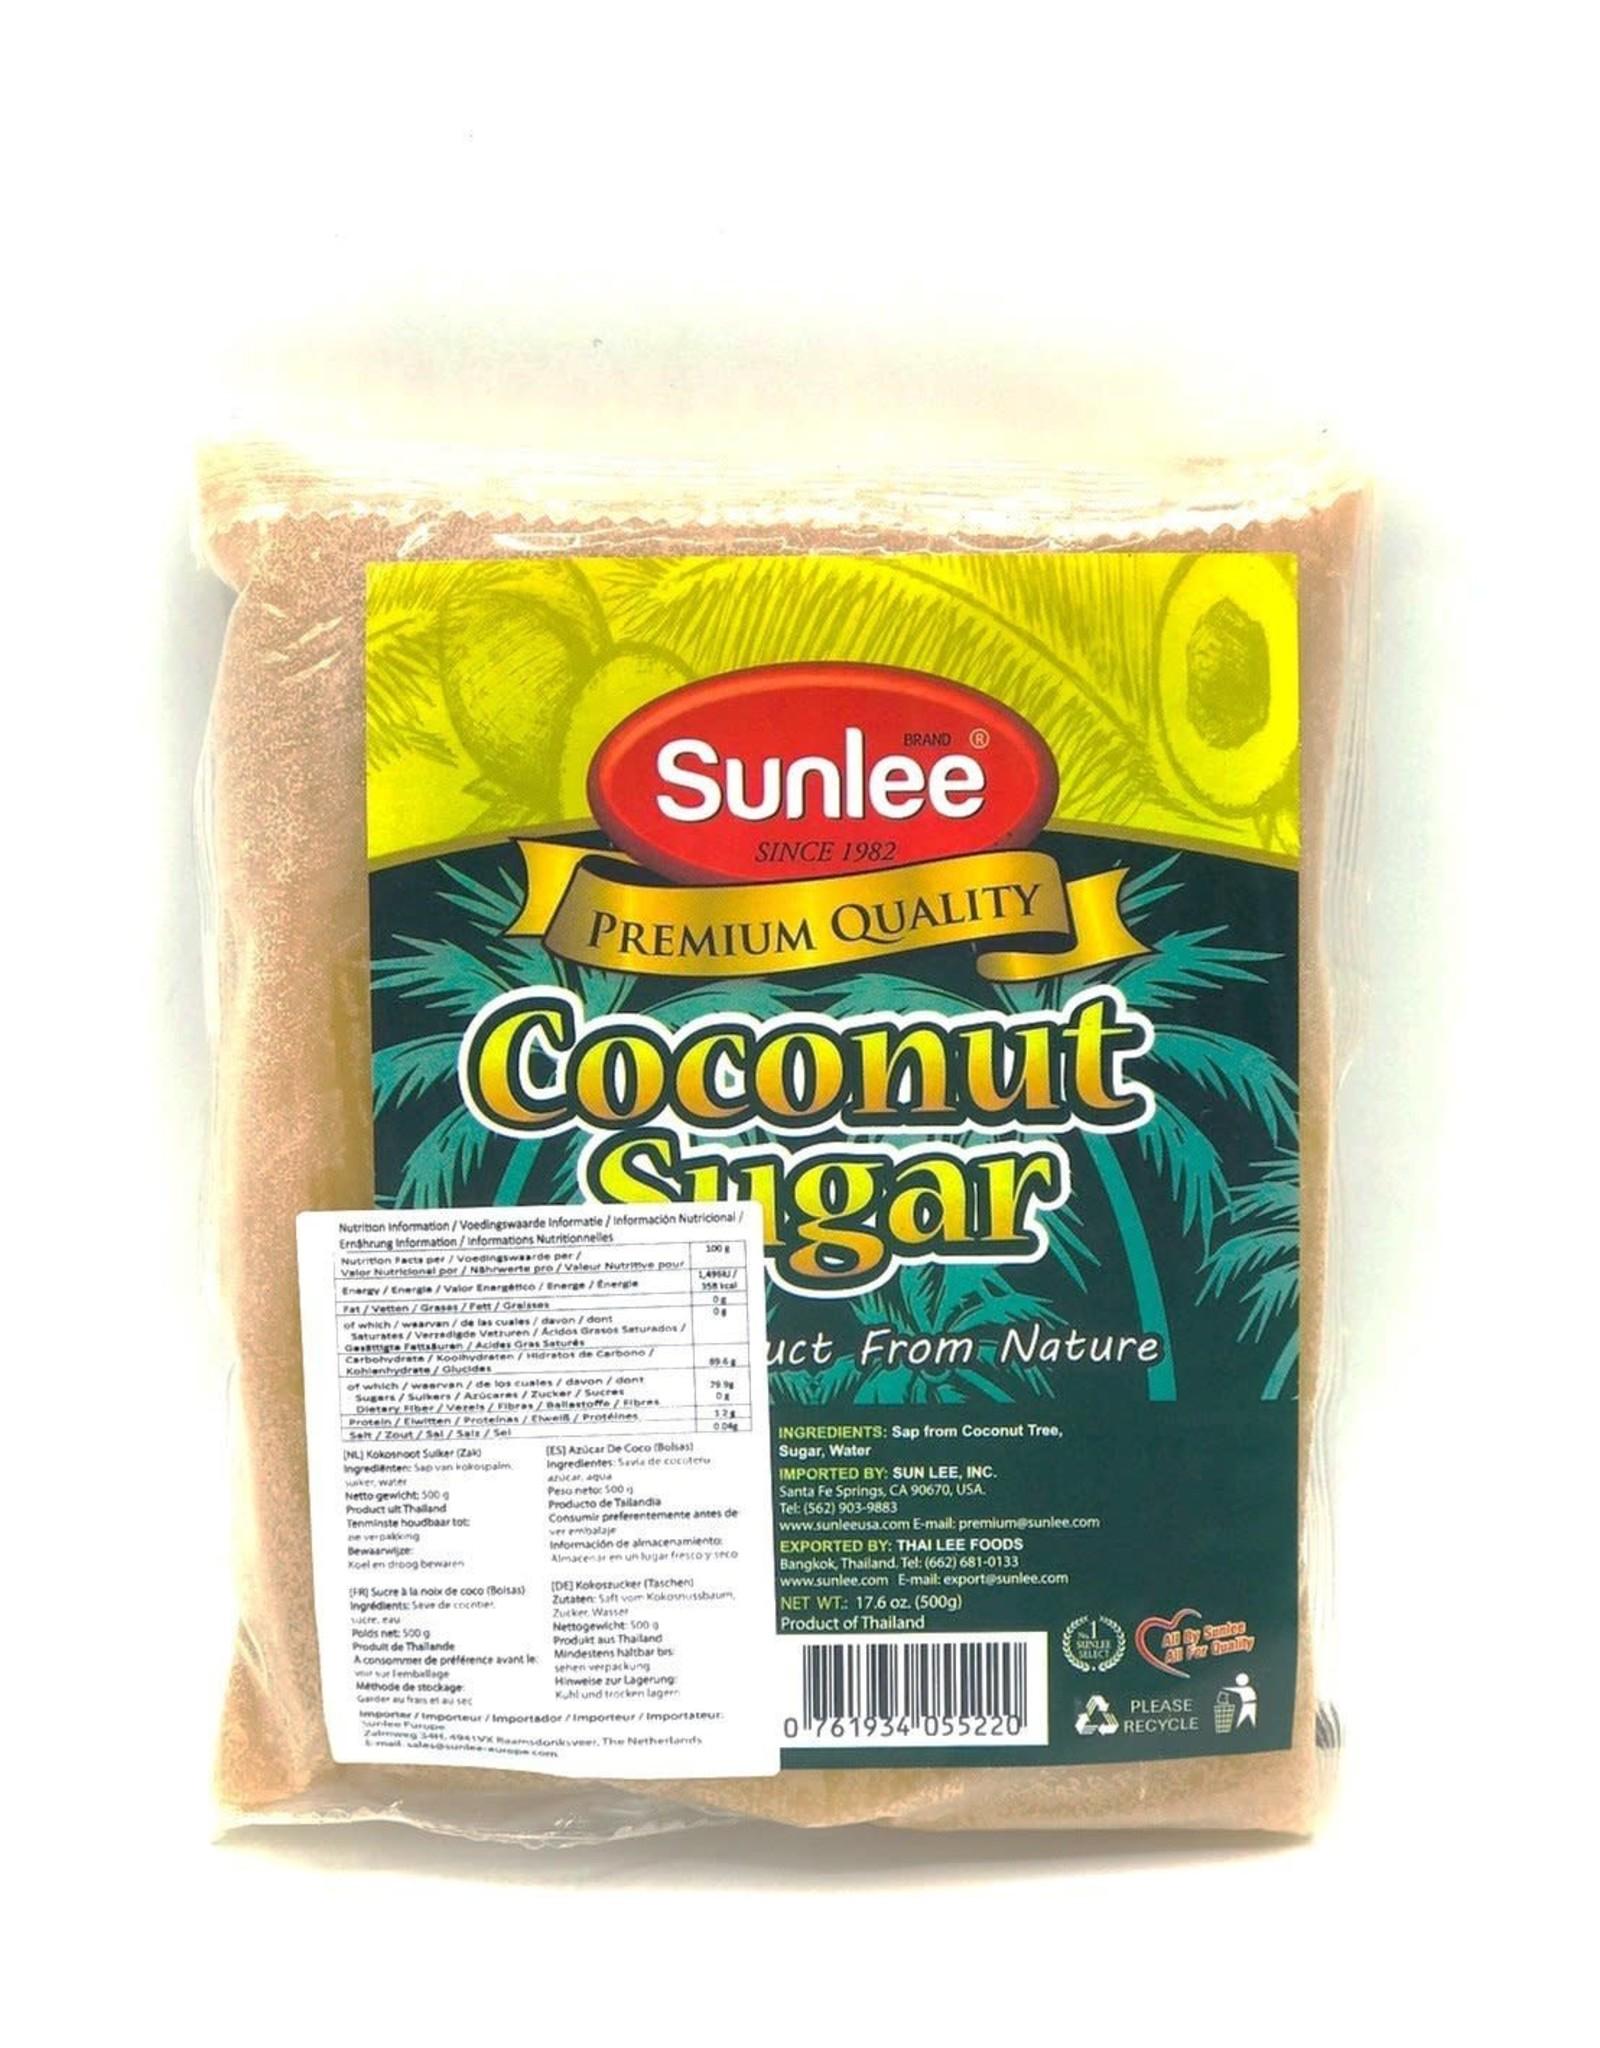 Sunlee Kokos Suikerzakje (500g)